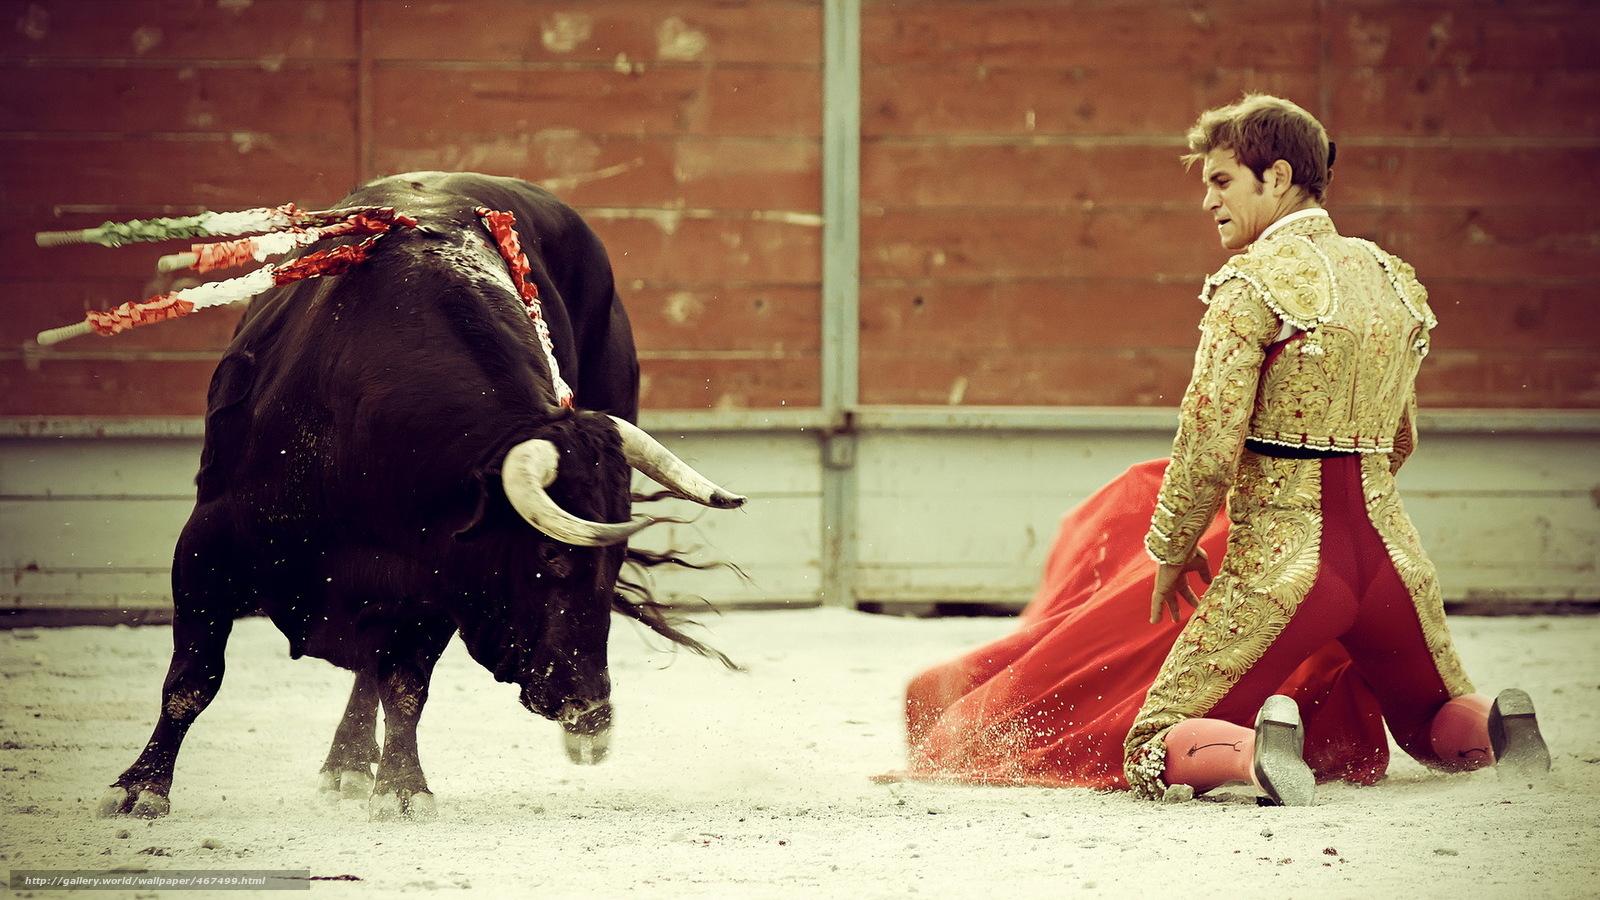 bull fighting 1920x1080 hd - photo #42